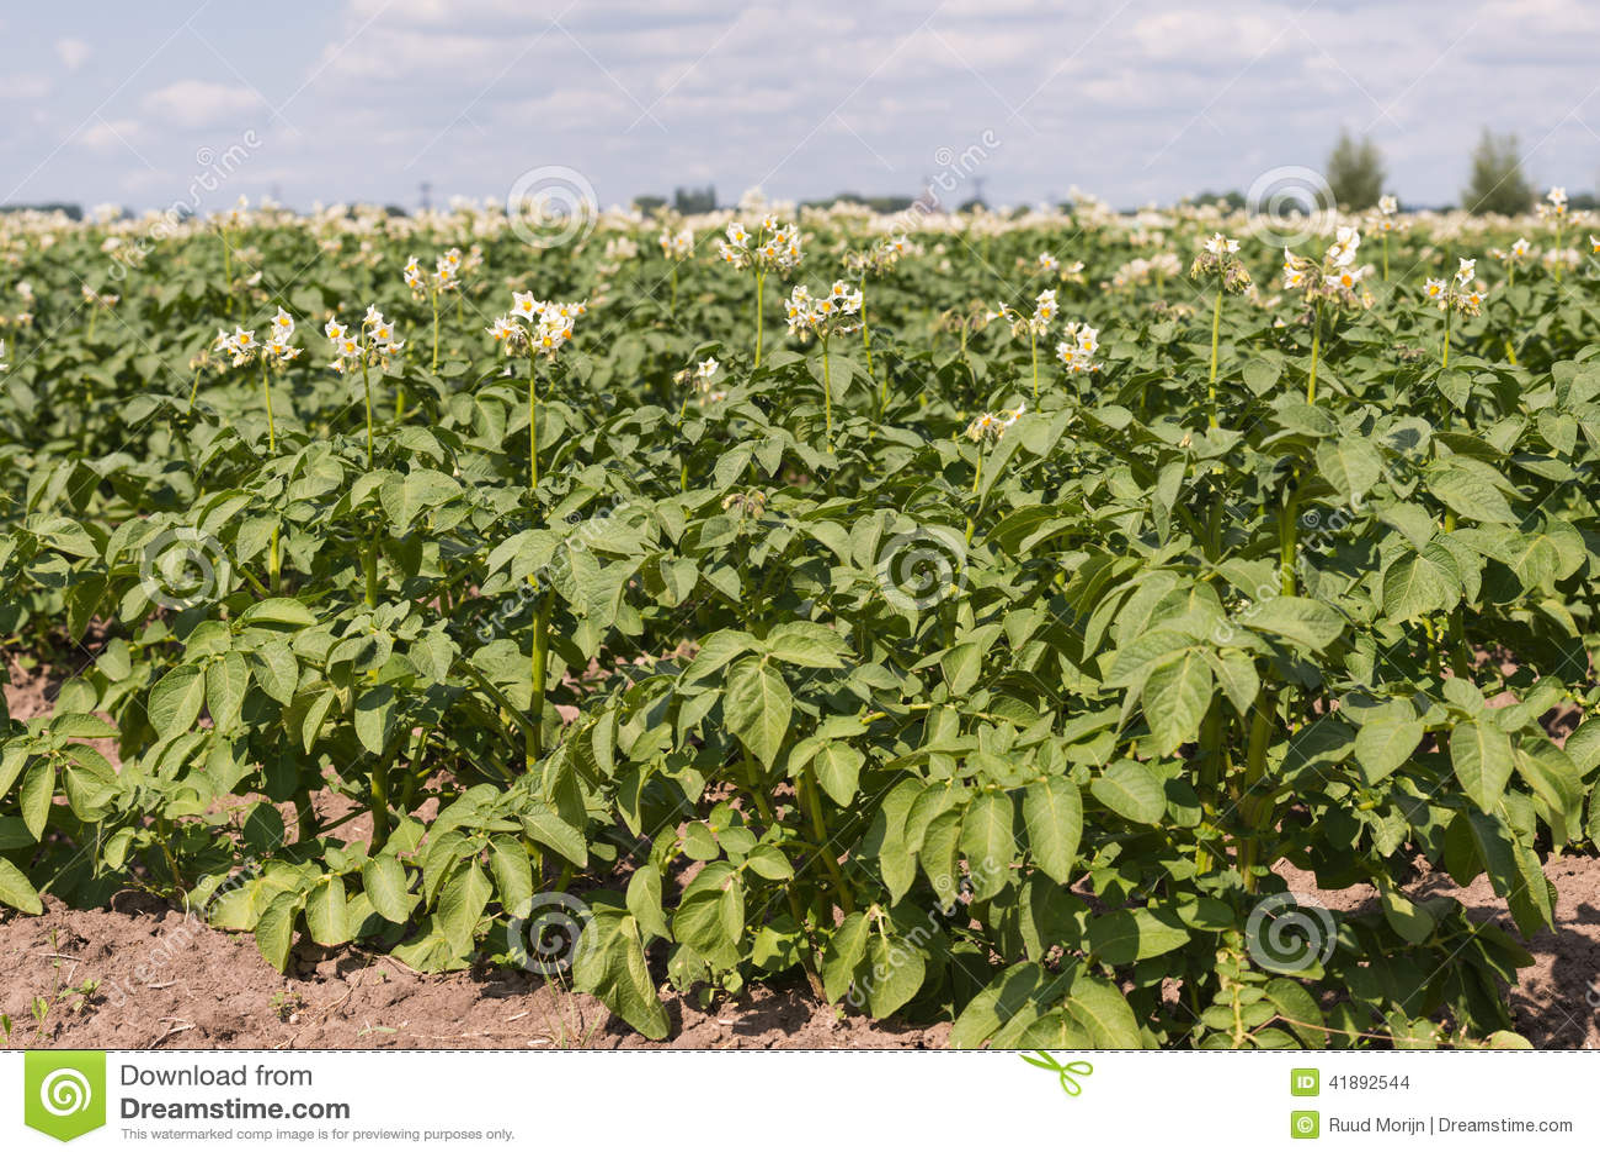 White Flowers With Yellow Stamens Of Potato Plants Stock Photo